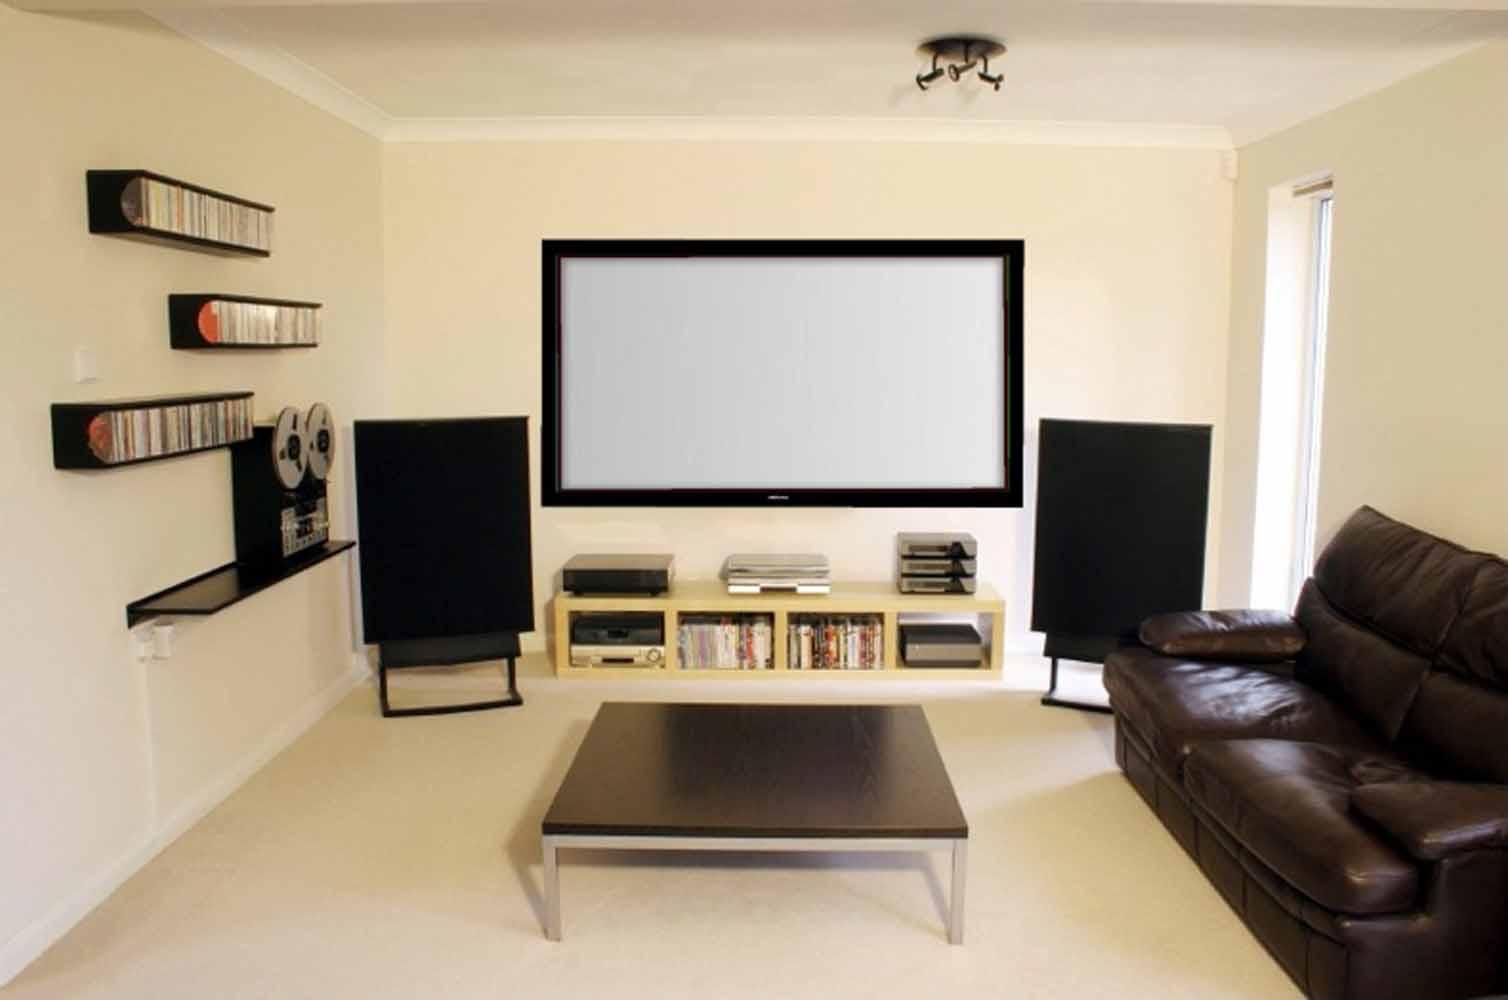 http://2.bp.blogspot.com/-0v5CoP_oLGg/TybTiJNKCbI/AAAAAAAAJIk/73p83KE4D34/s1600/Modern++living+room+interior+pictures.+(2).jpg